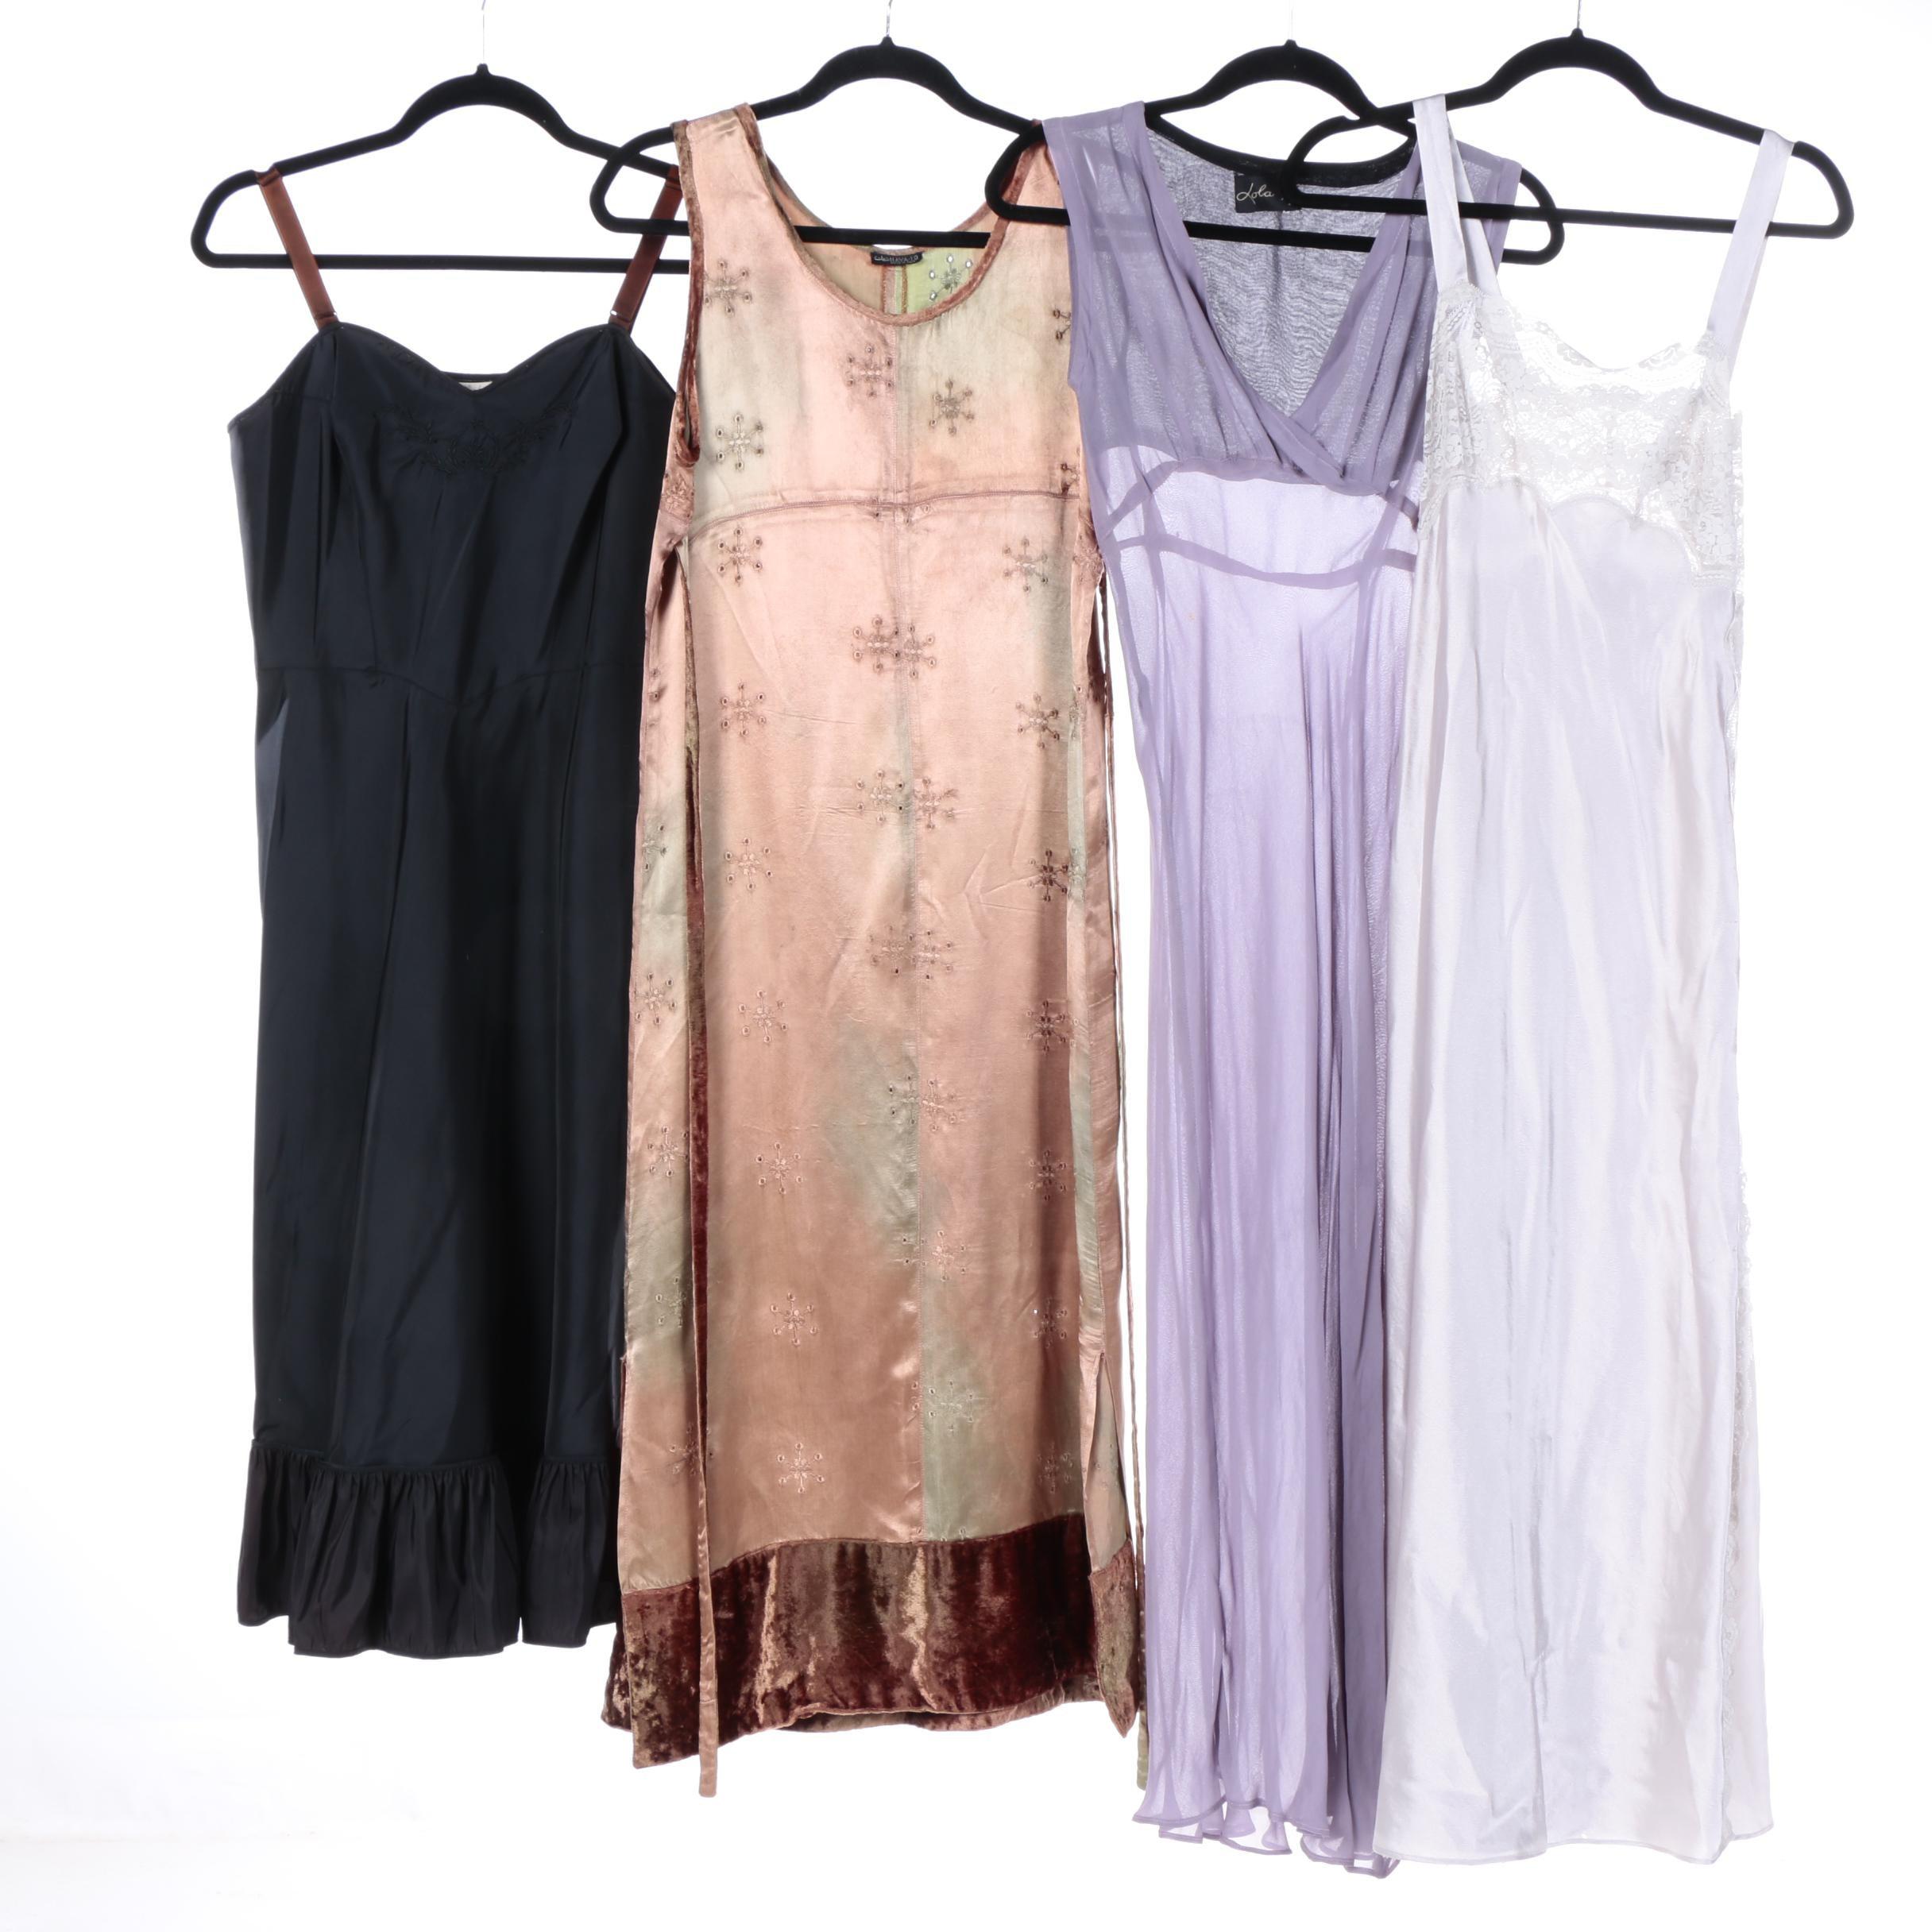 Vintage Slip Dresses Including Valentino Intimates